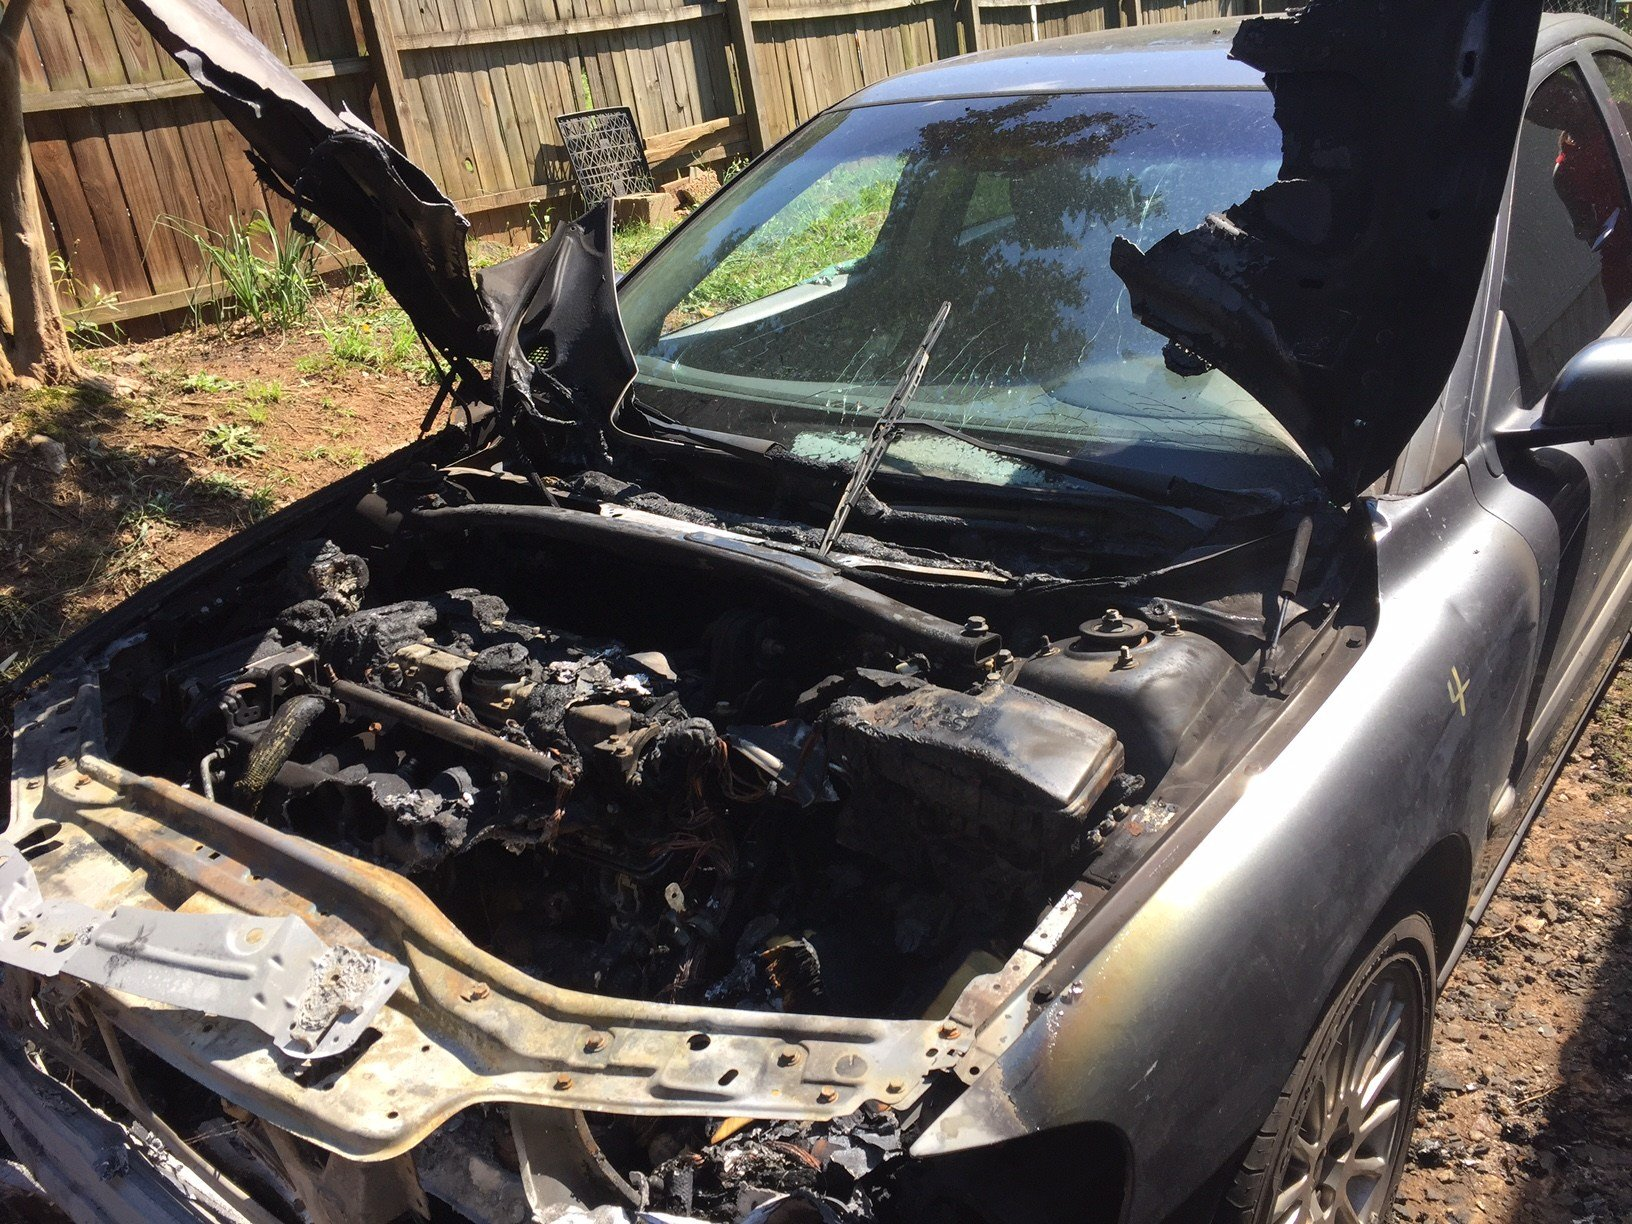 The car that caught fire (June 2, 2017/FOX Carolina)